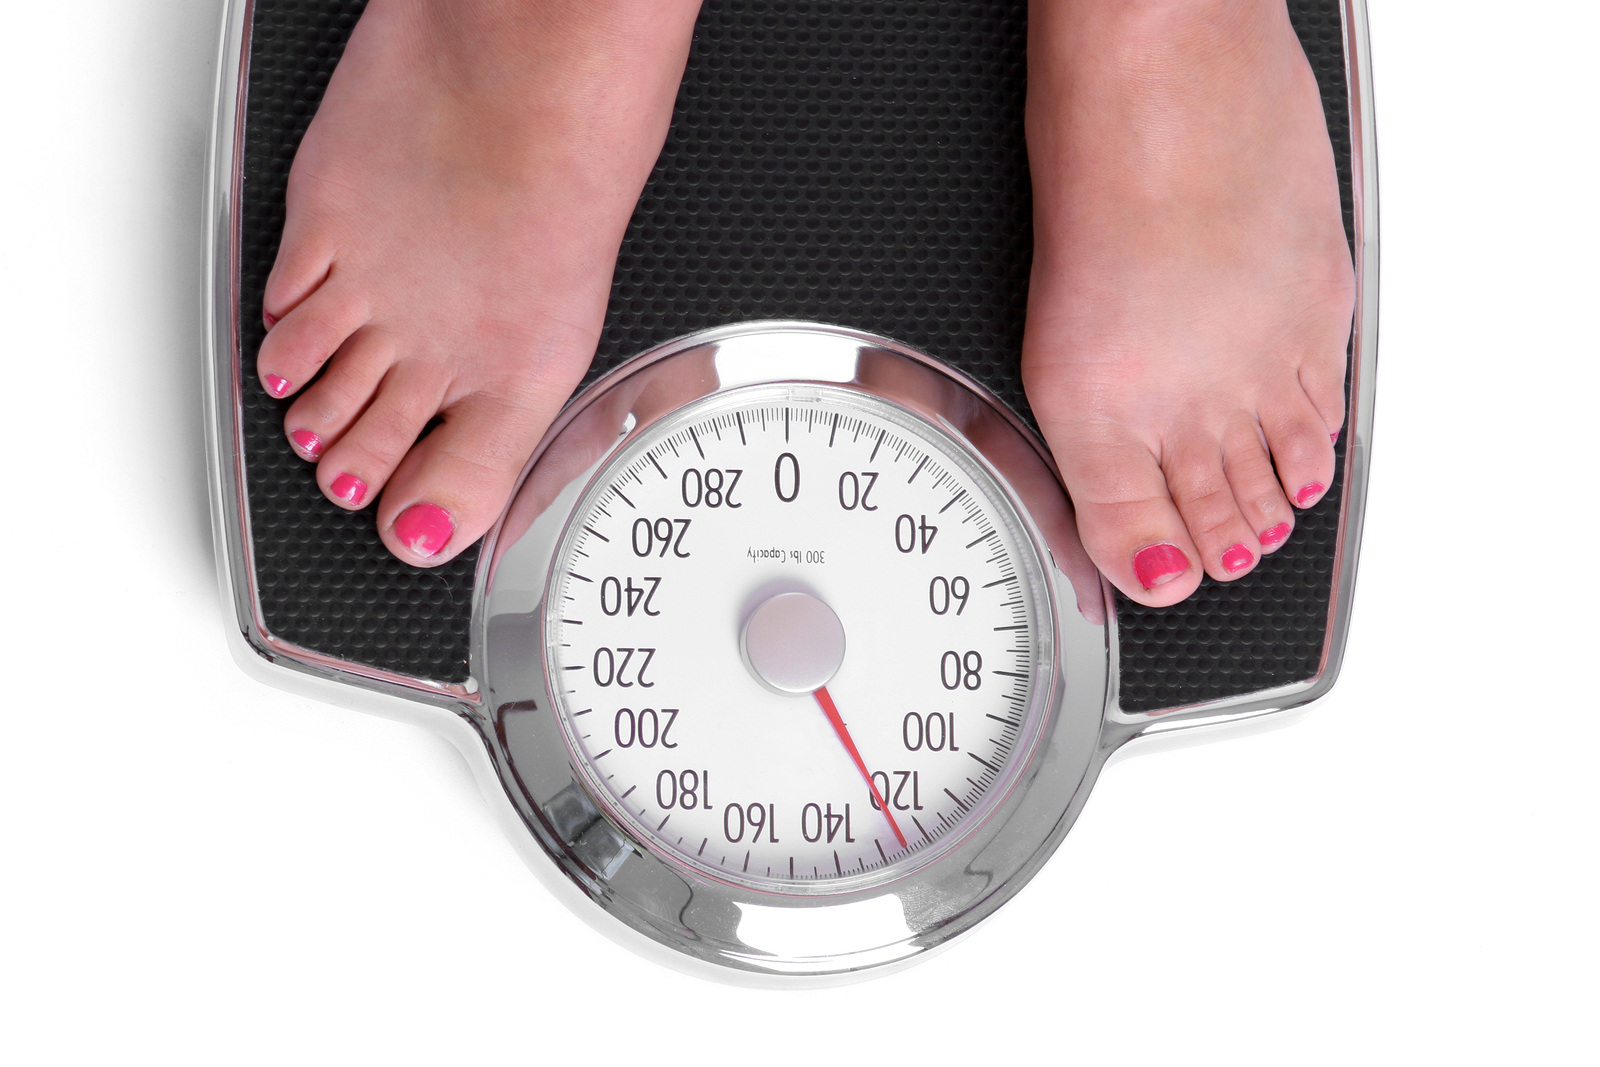 bigstock-weight-scale-12024860.jpg